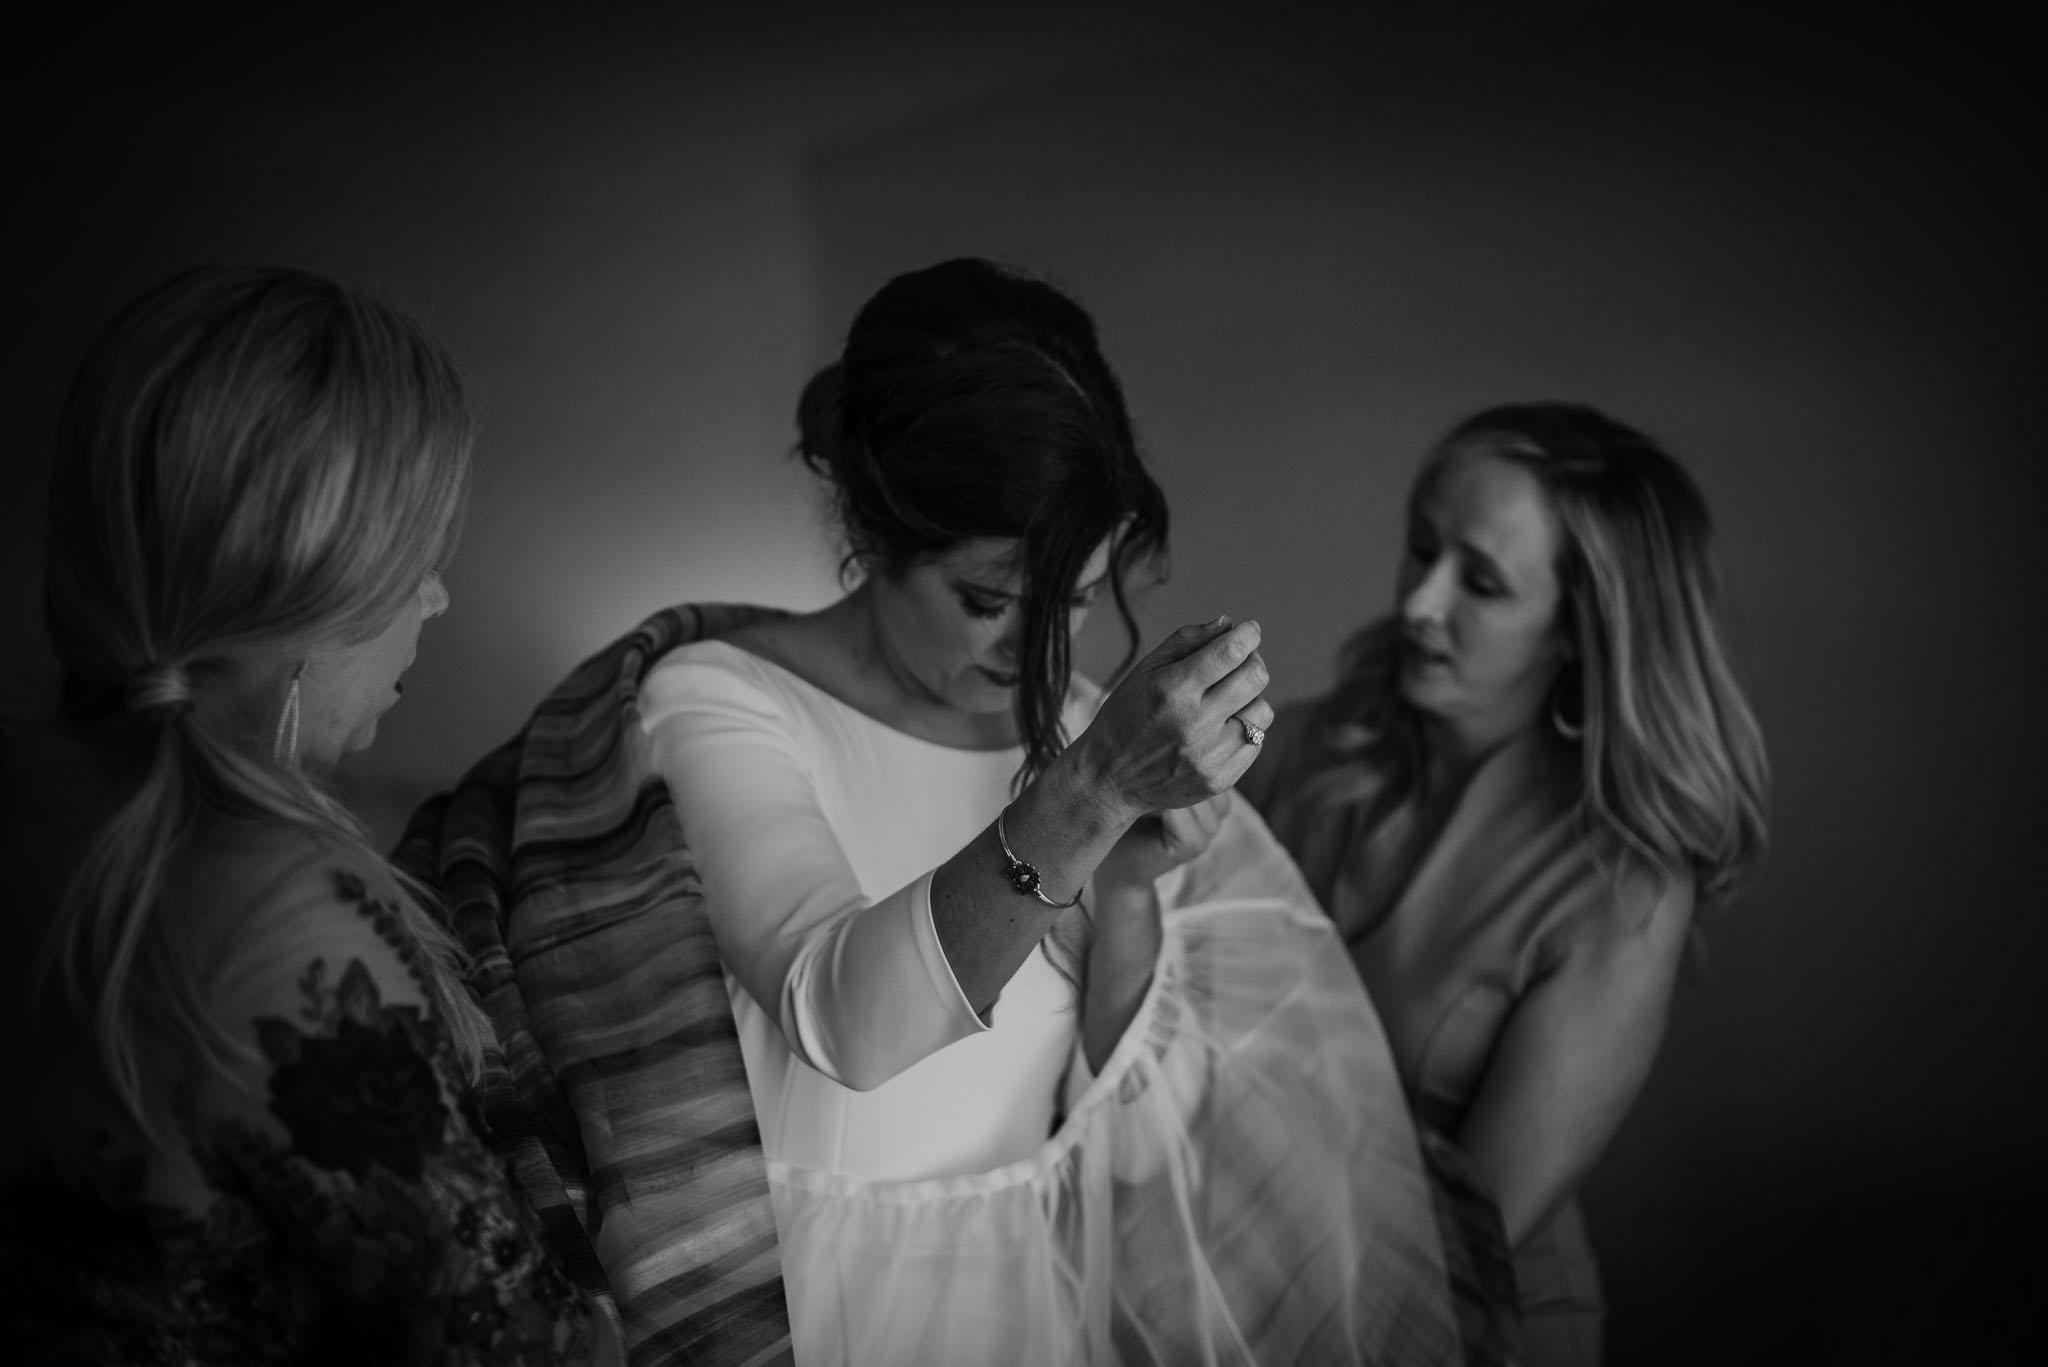 Bride's girlfriends helping her into her wedding dress.